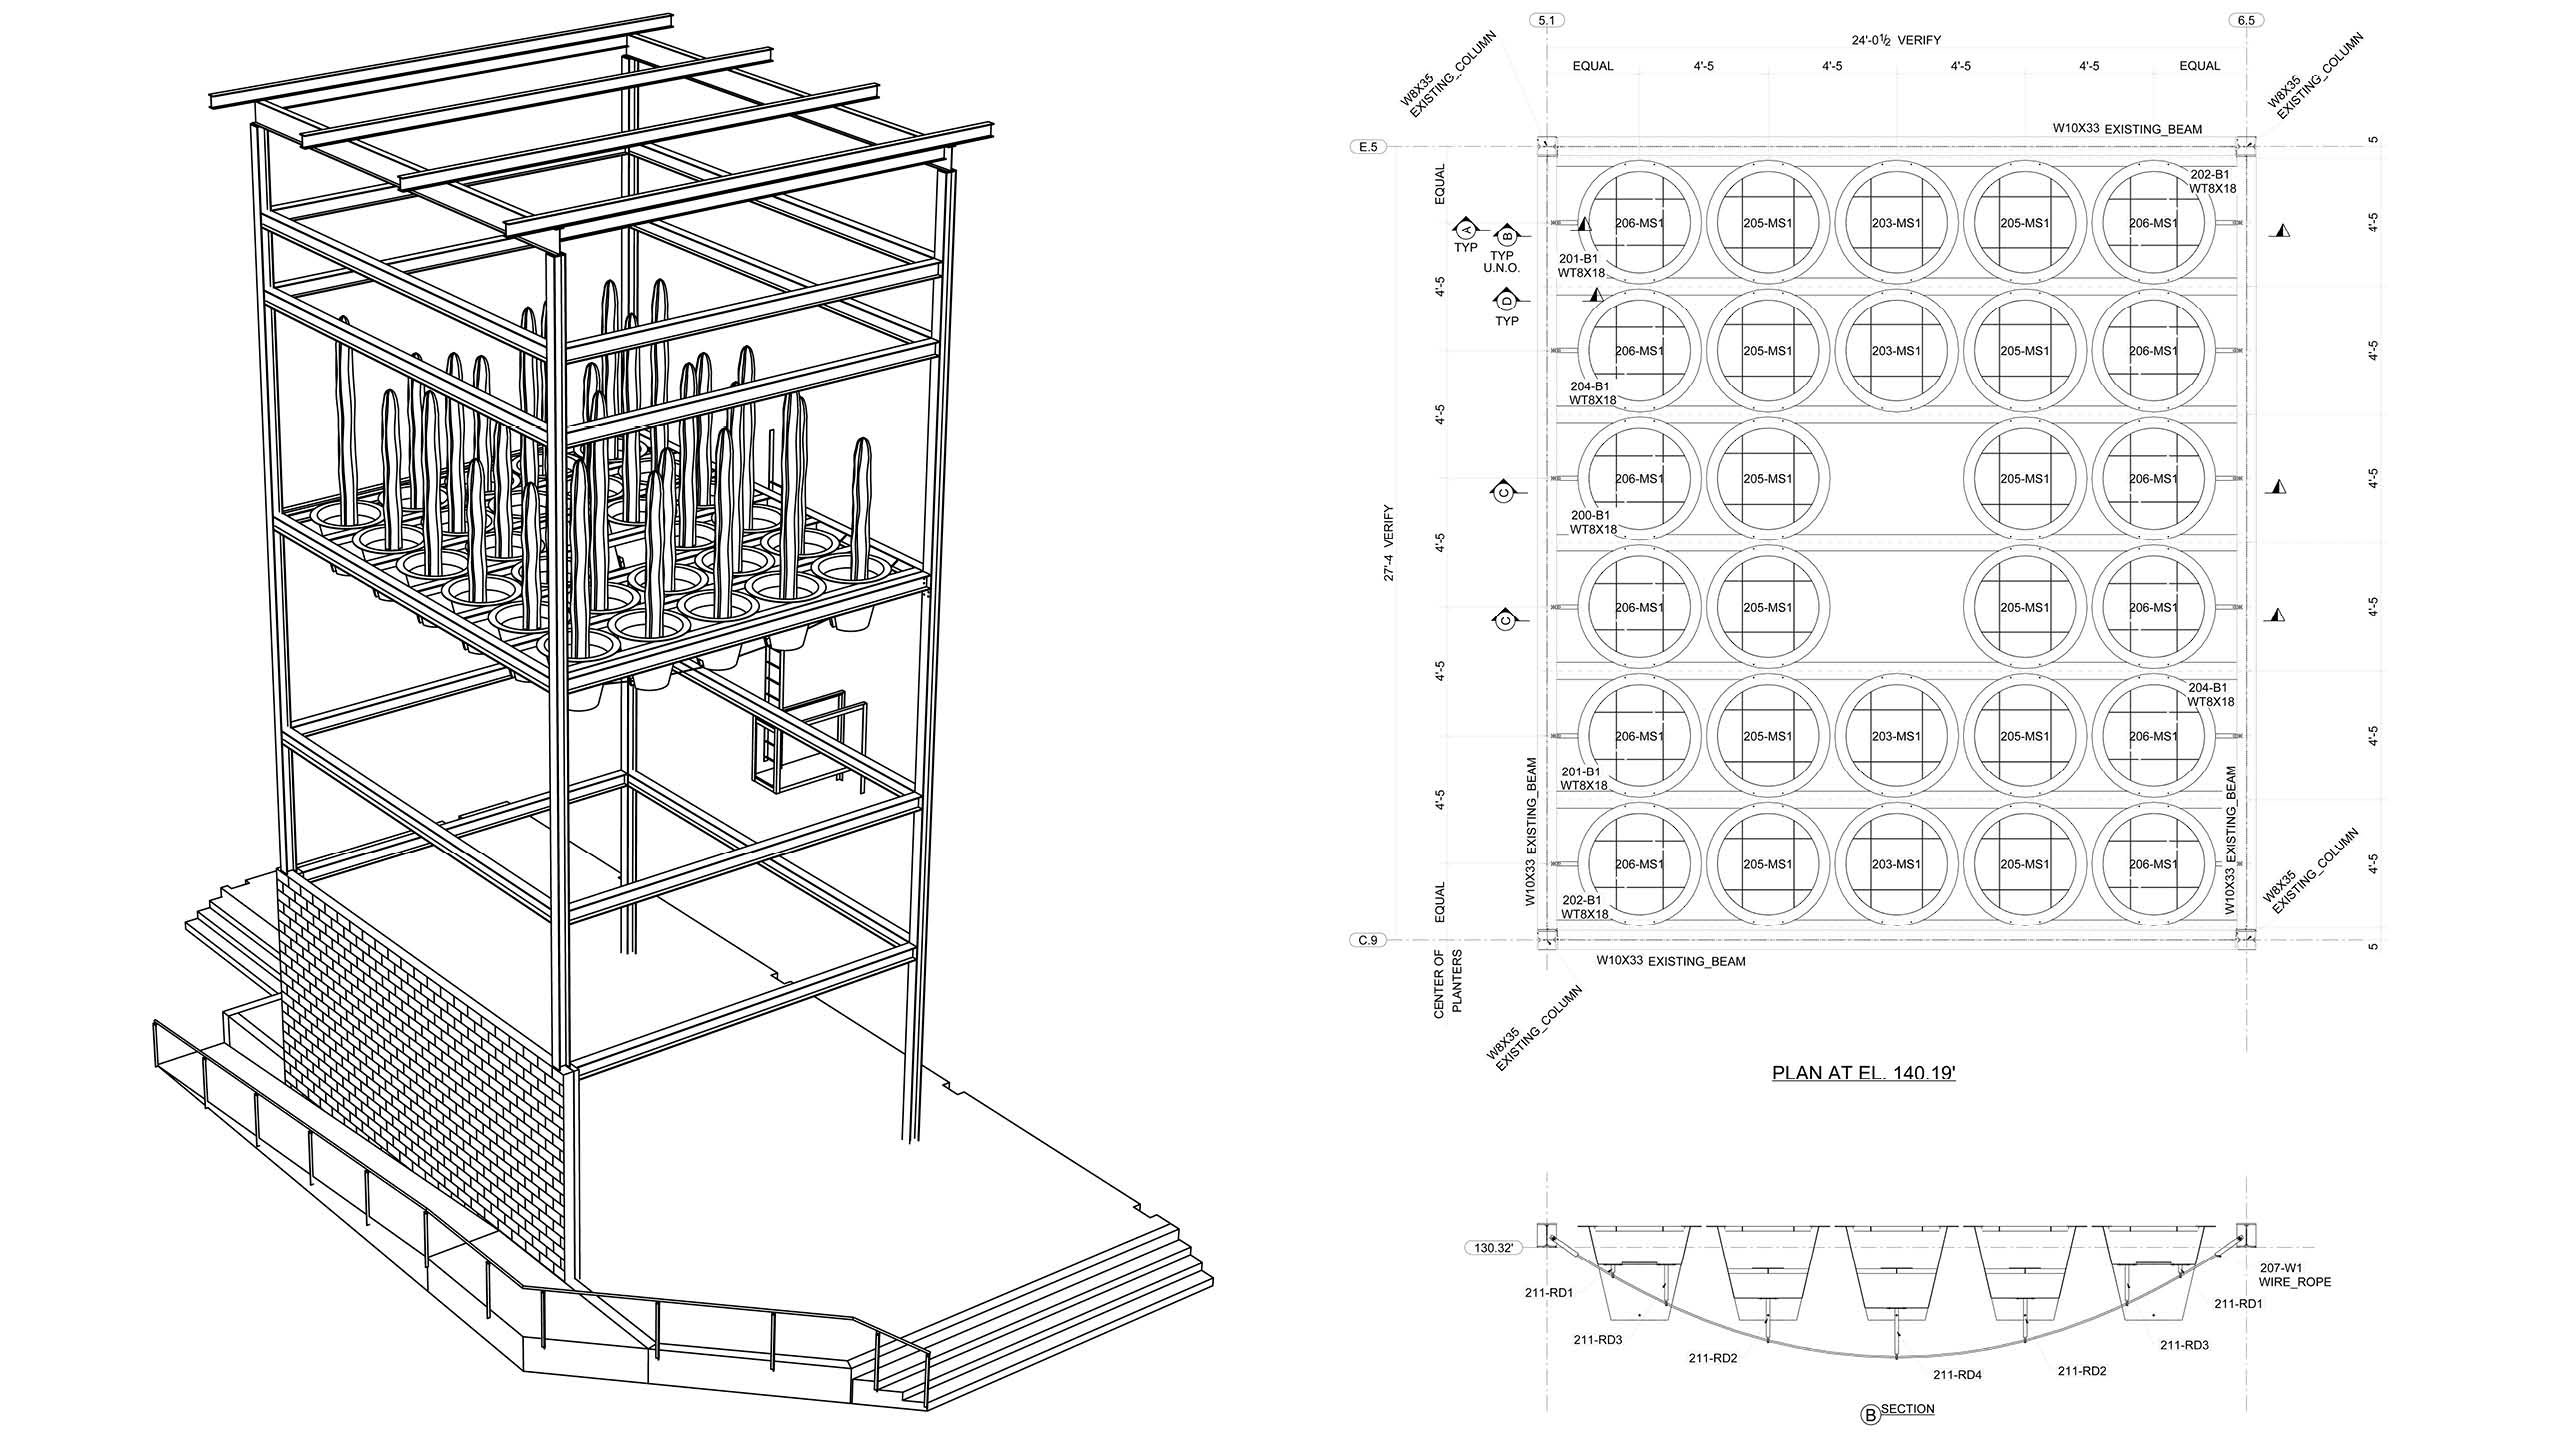 Cactus Tower Eric Owen Moss Architects